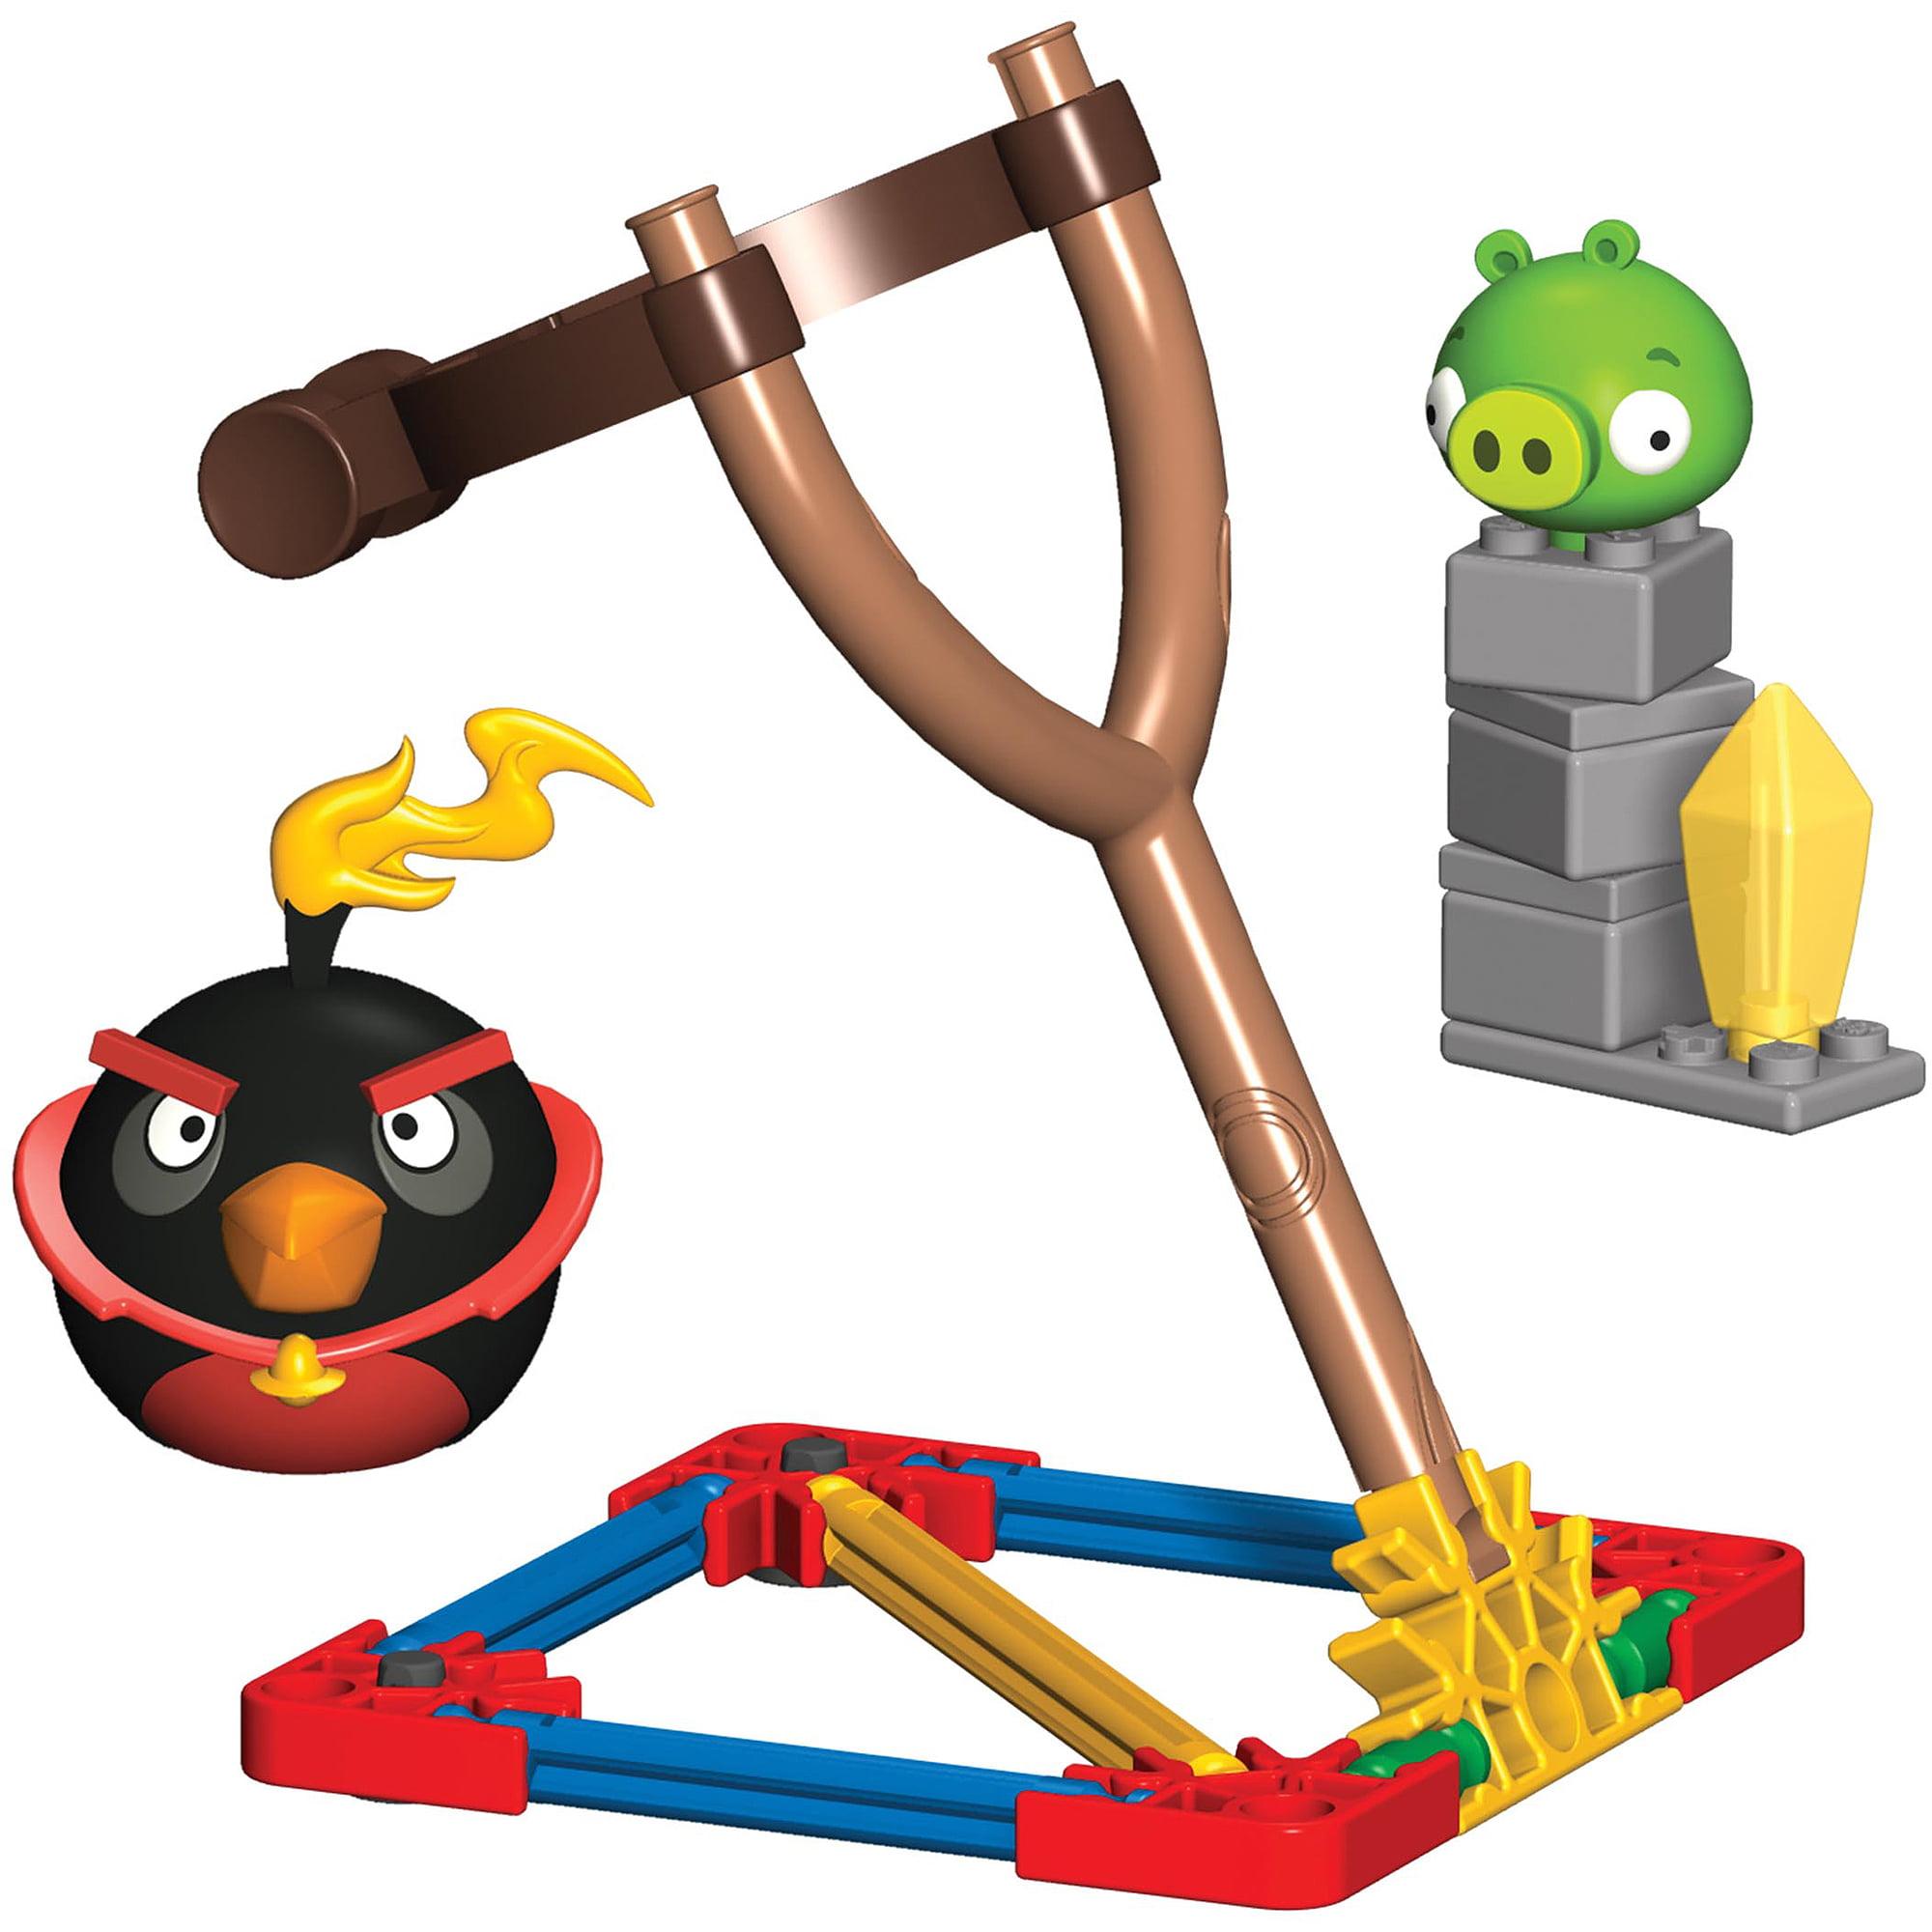 Mattel Angry Birds Space Game  Walmartcom